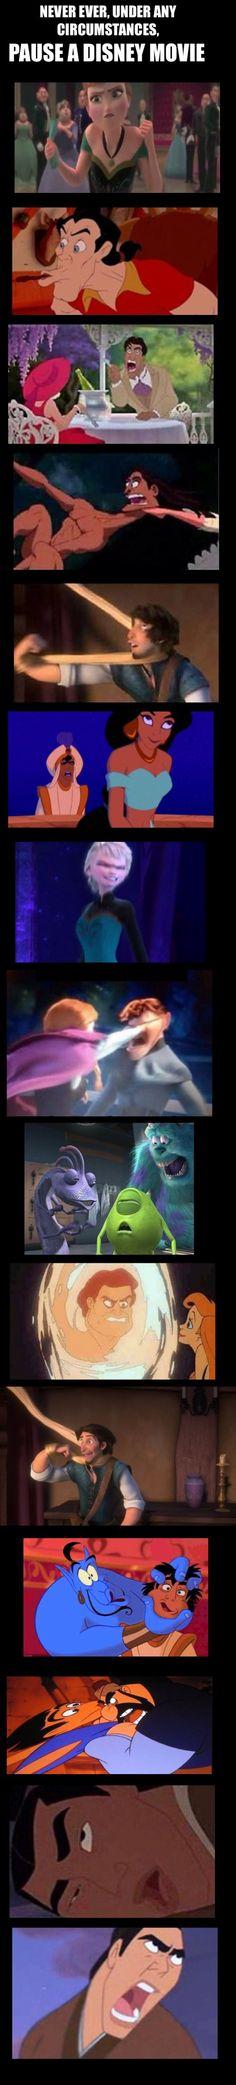 ALWAYS, under every circumstances, pause a Disney movie.